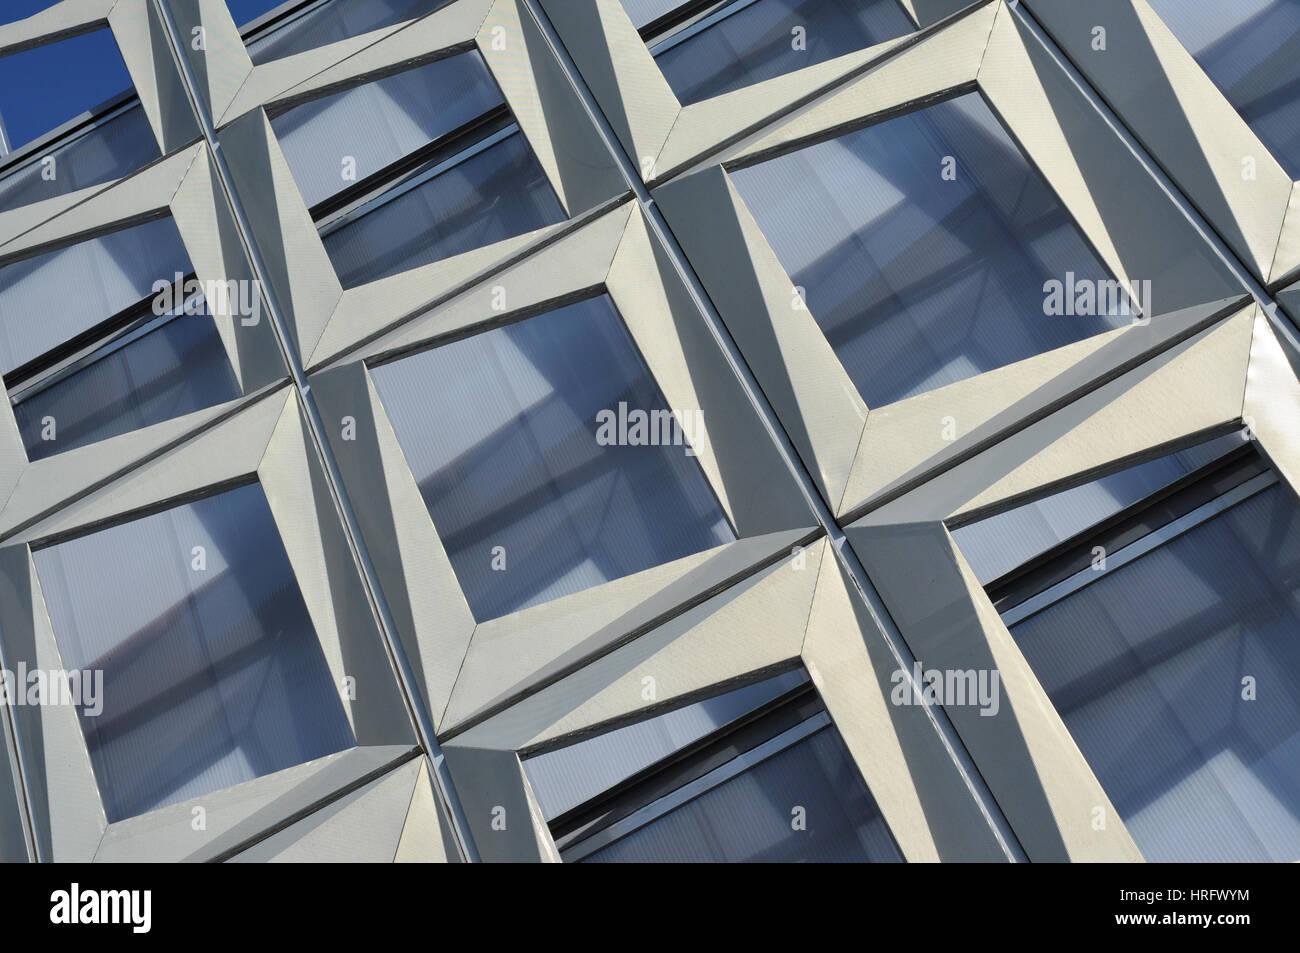 Modern Architecture Pattern modern architecture pattern of a stadium stock photo, royalty free